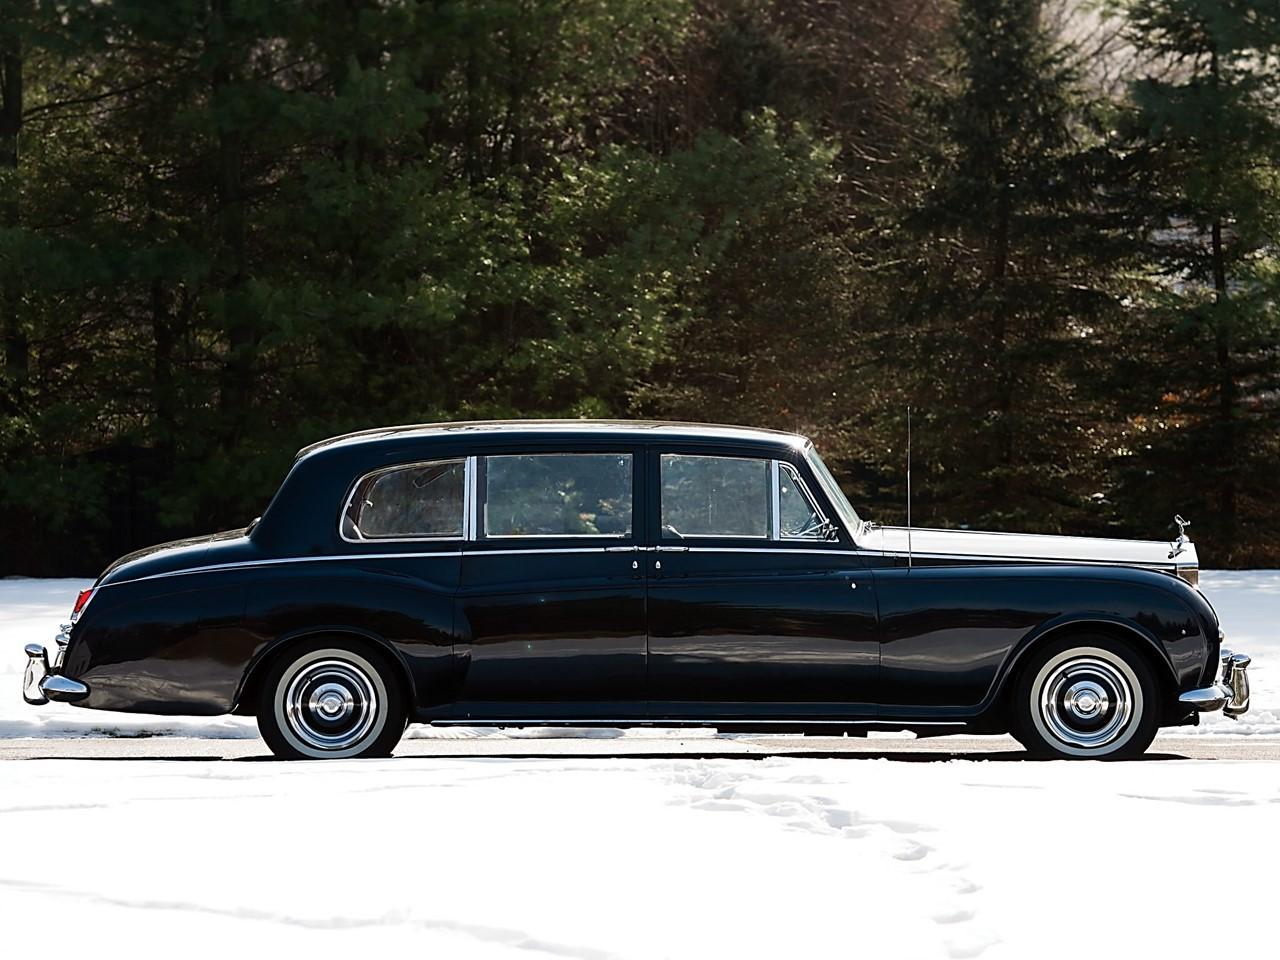 1959 Phantom V Park Ward coachbuilt limousine 2